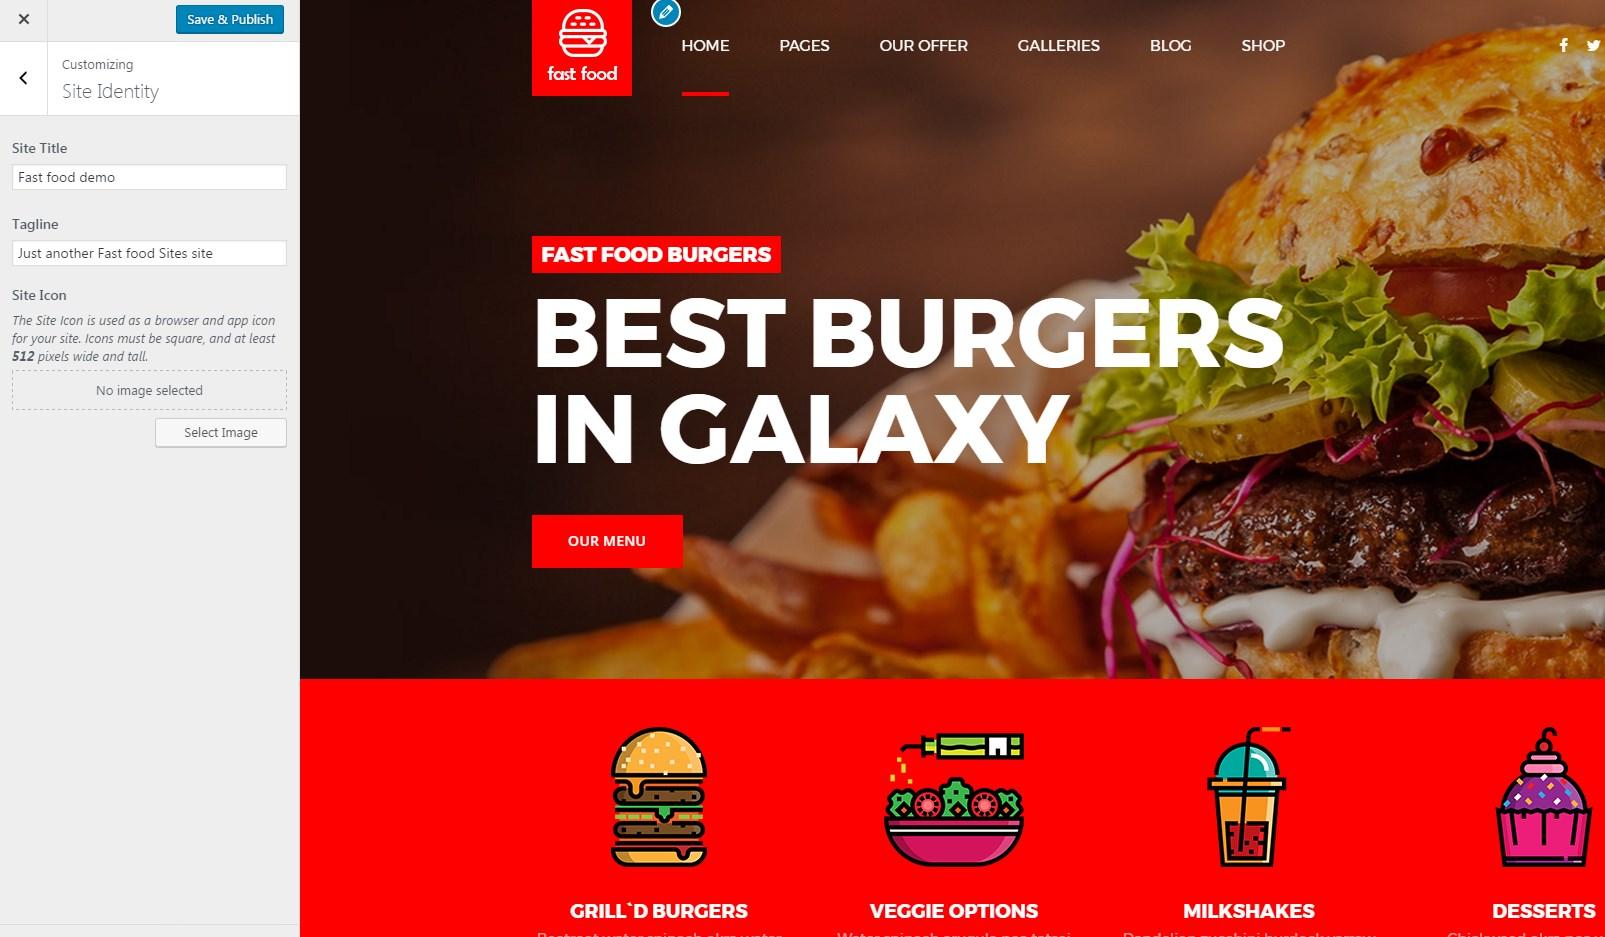 https://documentation.bold-themes.com/fast-food/wp-content/uploads/sites/13/2016/07/19-1.jpg